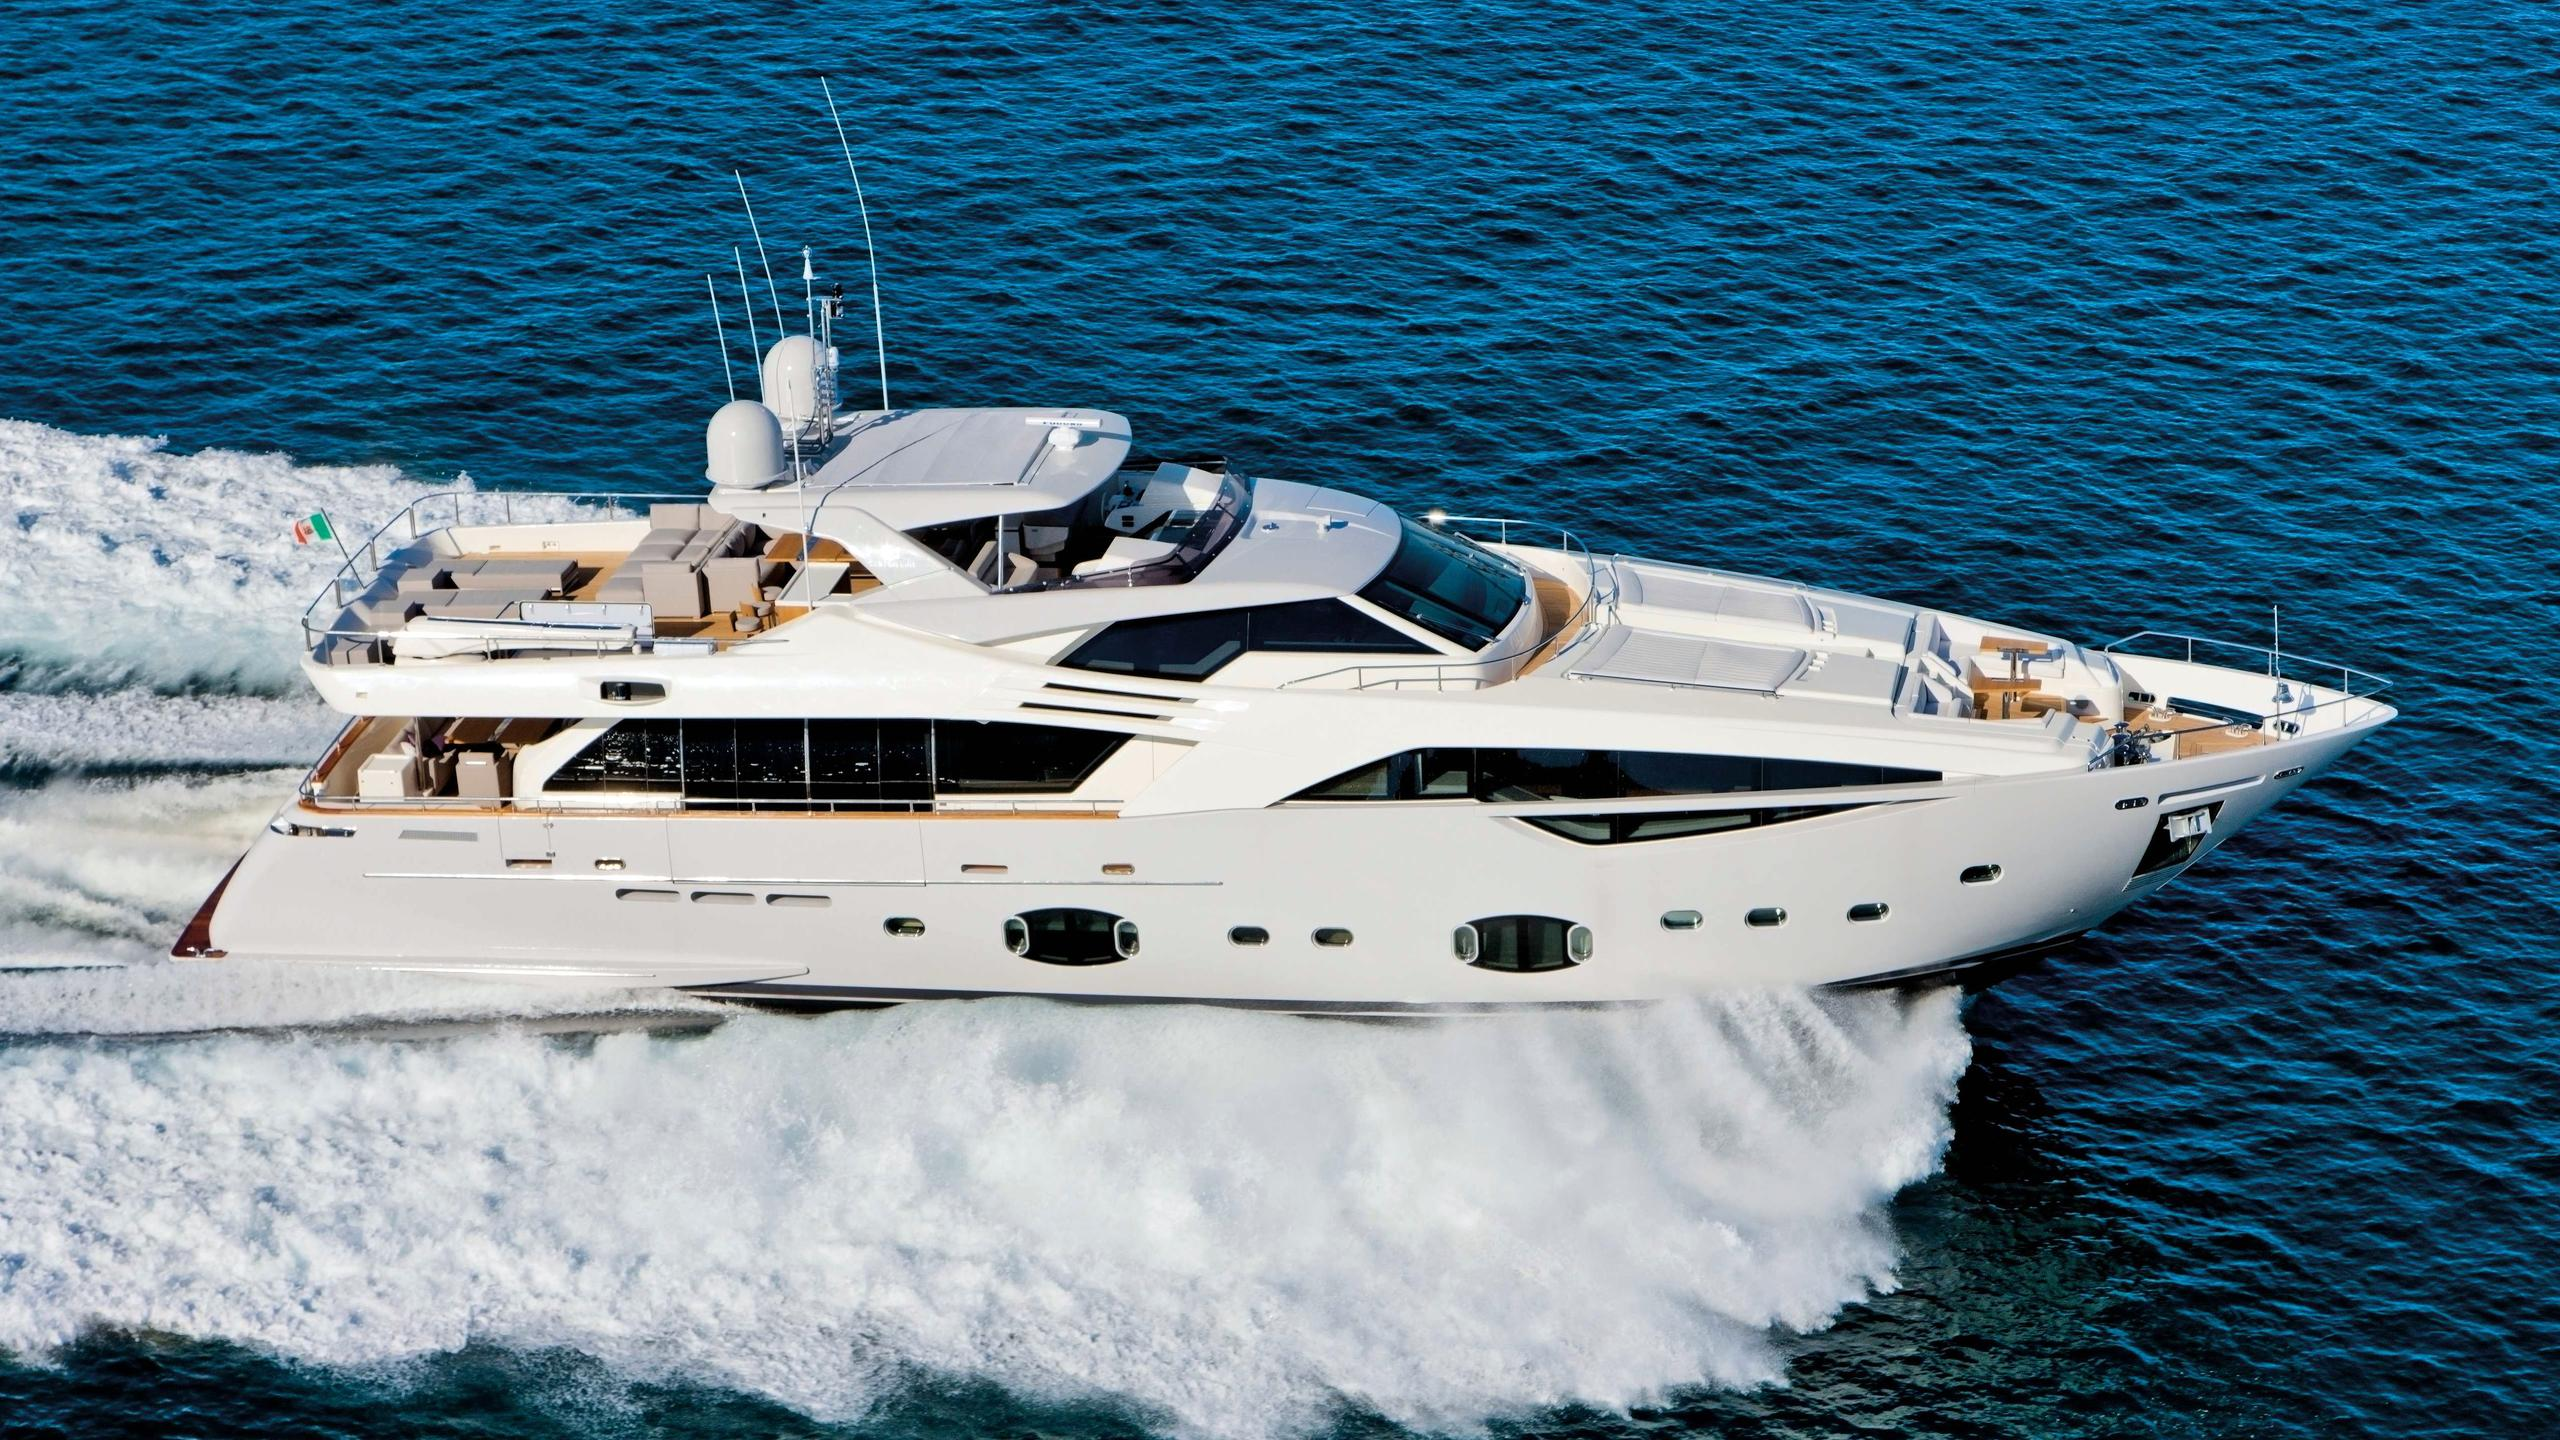 kiara-3-motor-yacht-ferretti-custom-line-100-2013-31m-aerial